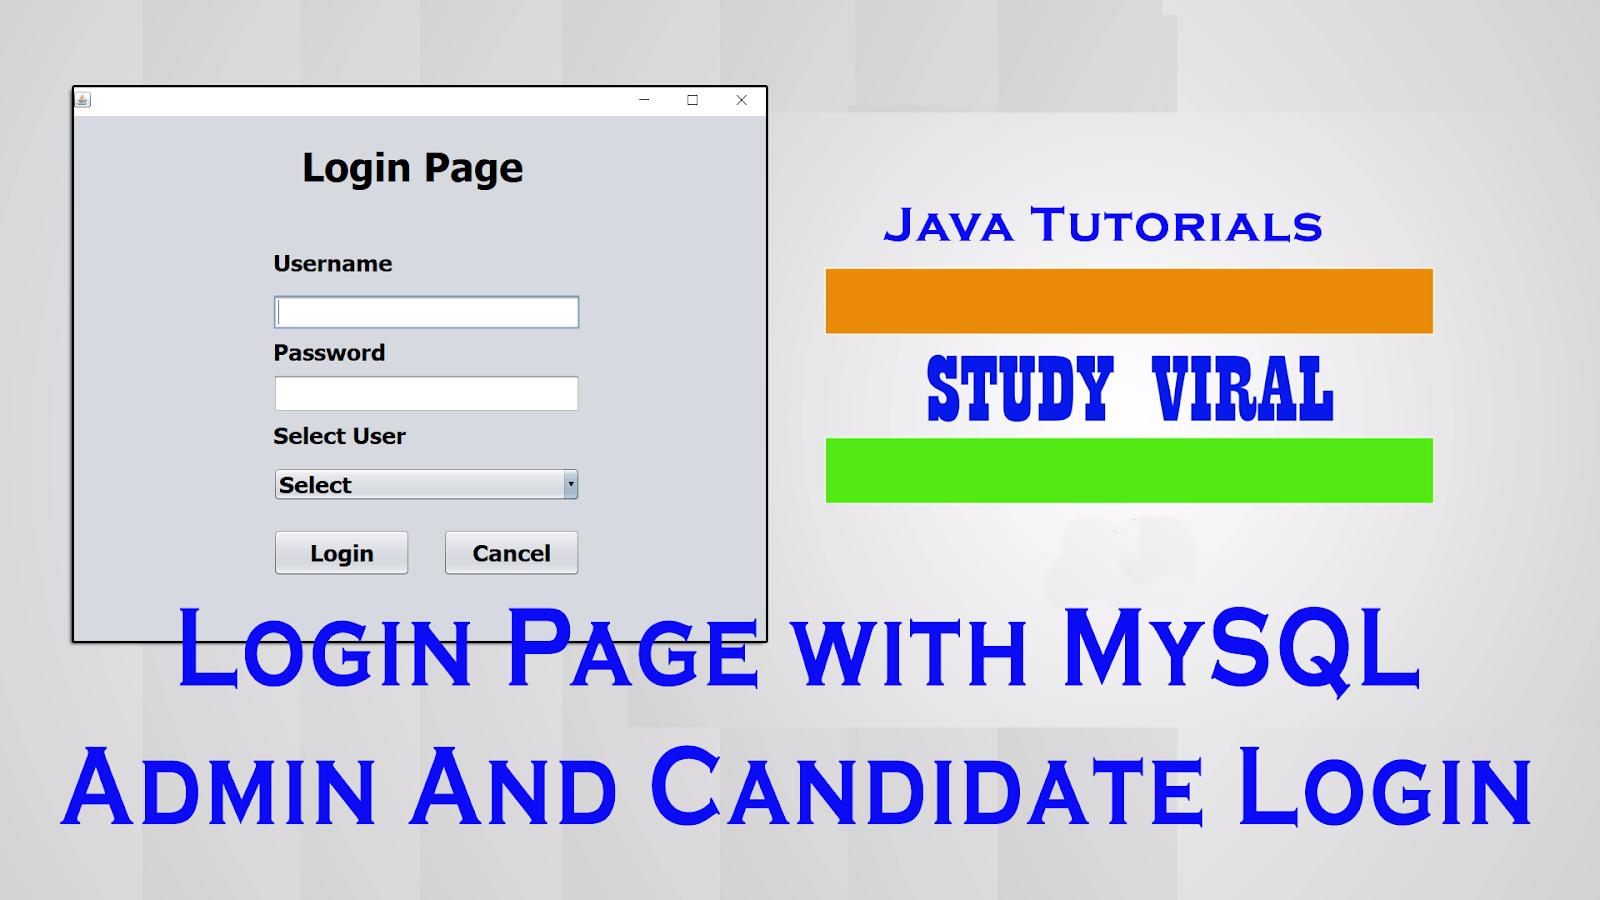 Java swing multiplemulti user login in netbeans and mysql database java swing multiplemulti user login in netbeans and mysql database studyviral baditri Choice Image